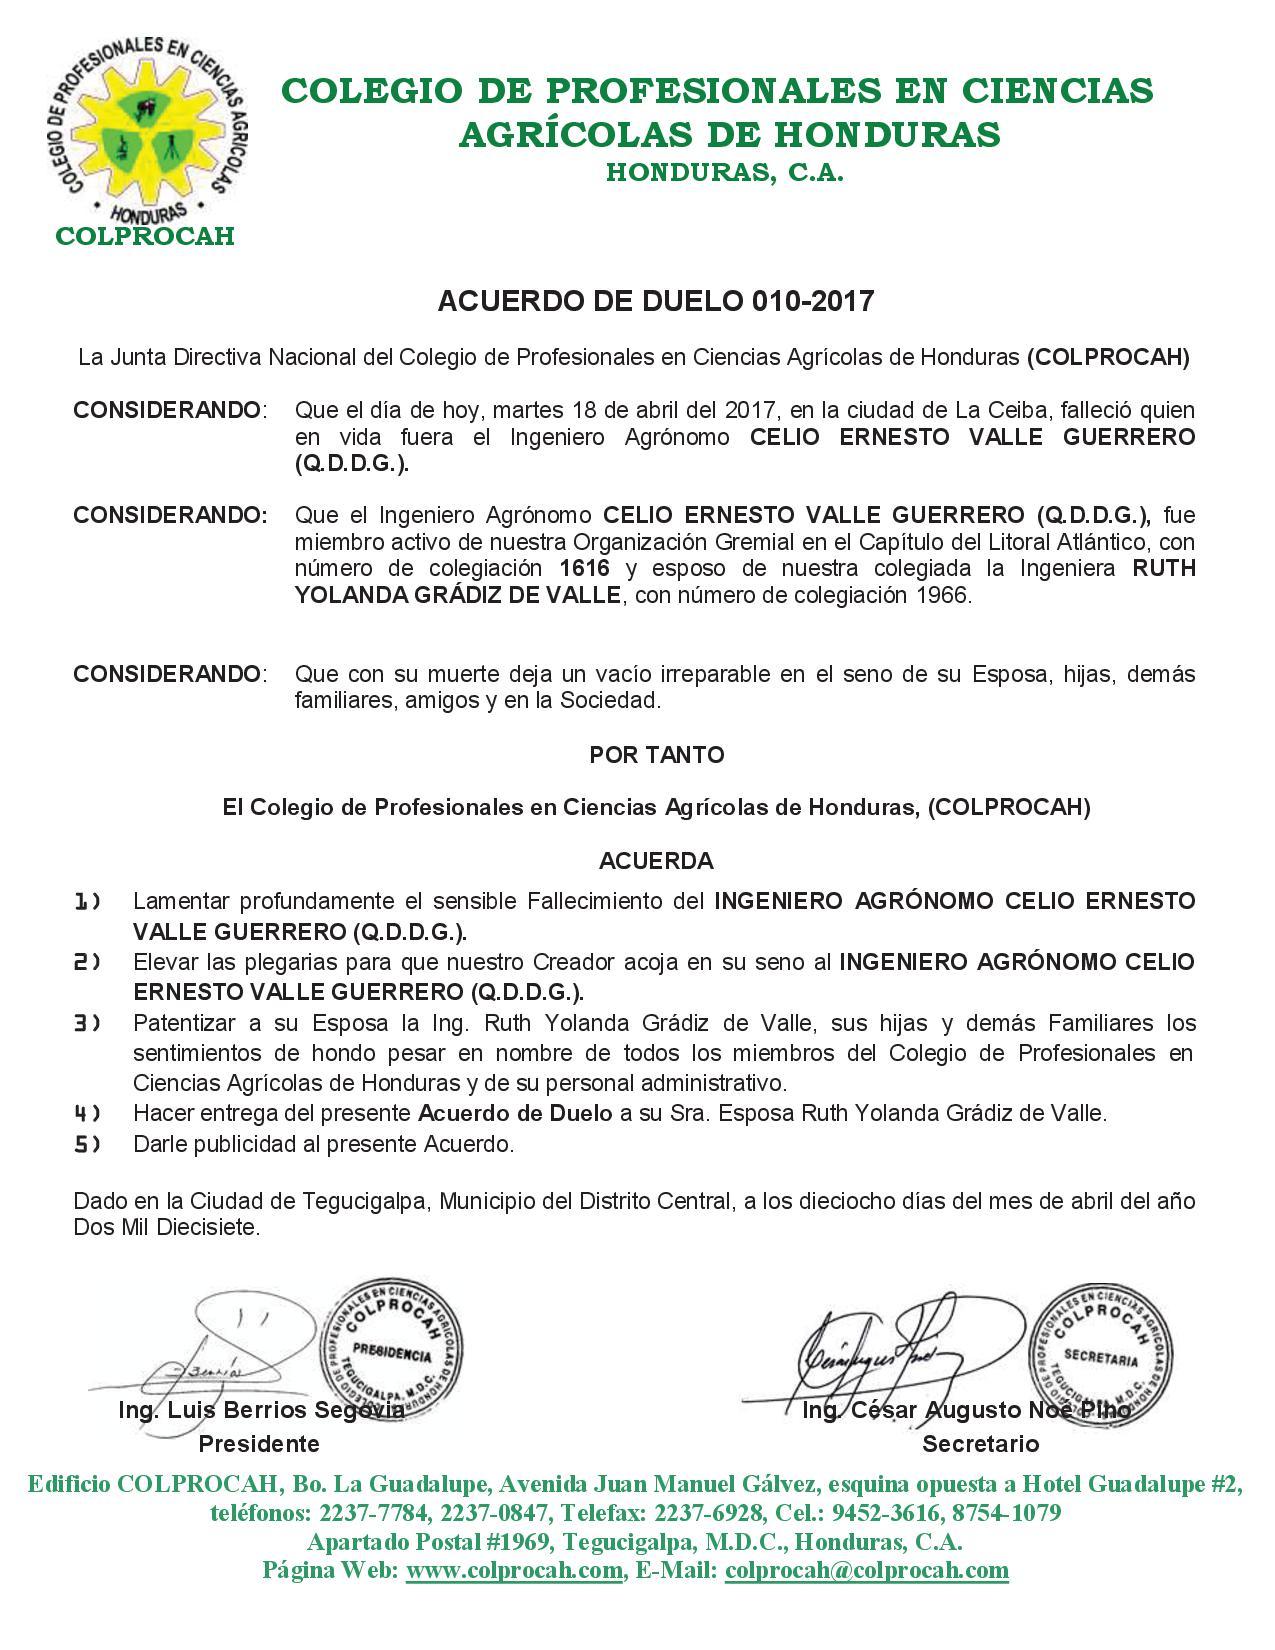 Acuerdo de Duelo 010-2017 CELIO ERNESTO VALLE GUERRERO